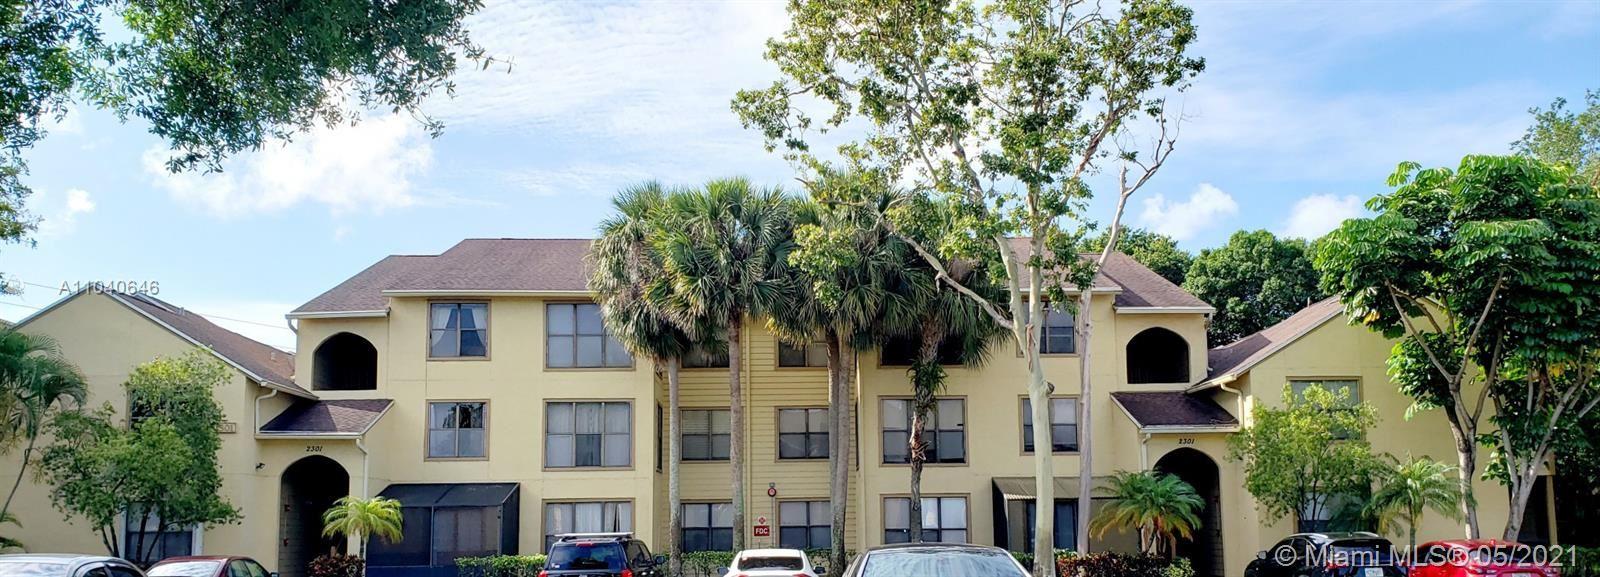 2301 N Congress Ave #17, Boynton Beach, FL 33426 - #: A11040646